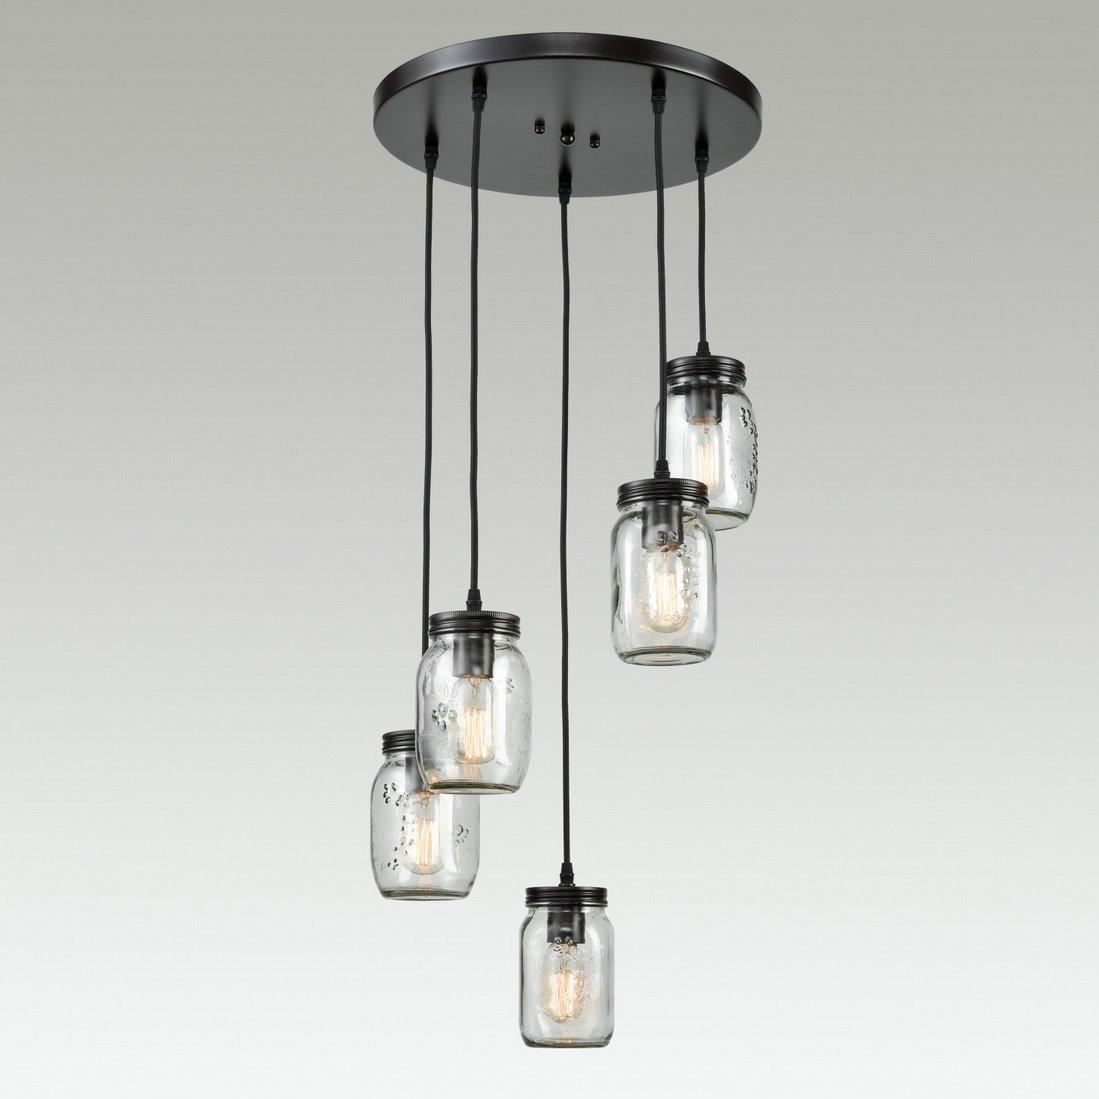 Mason Jar Kitchen Lighting: EUL Mason Jar Kitchen Island Lighting 5-Light Glass Jar